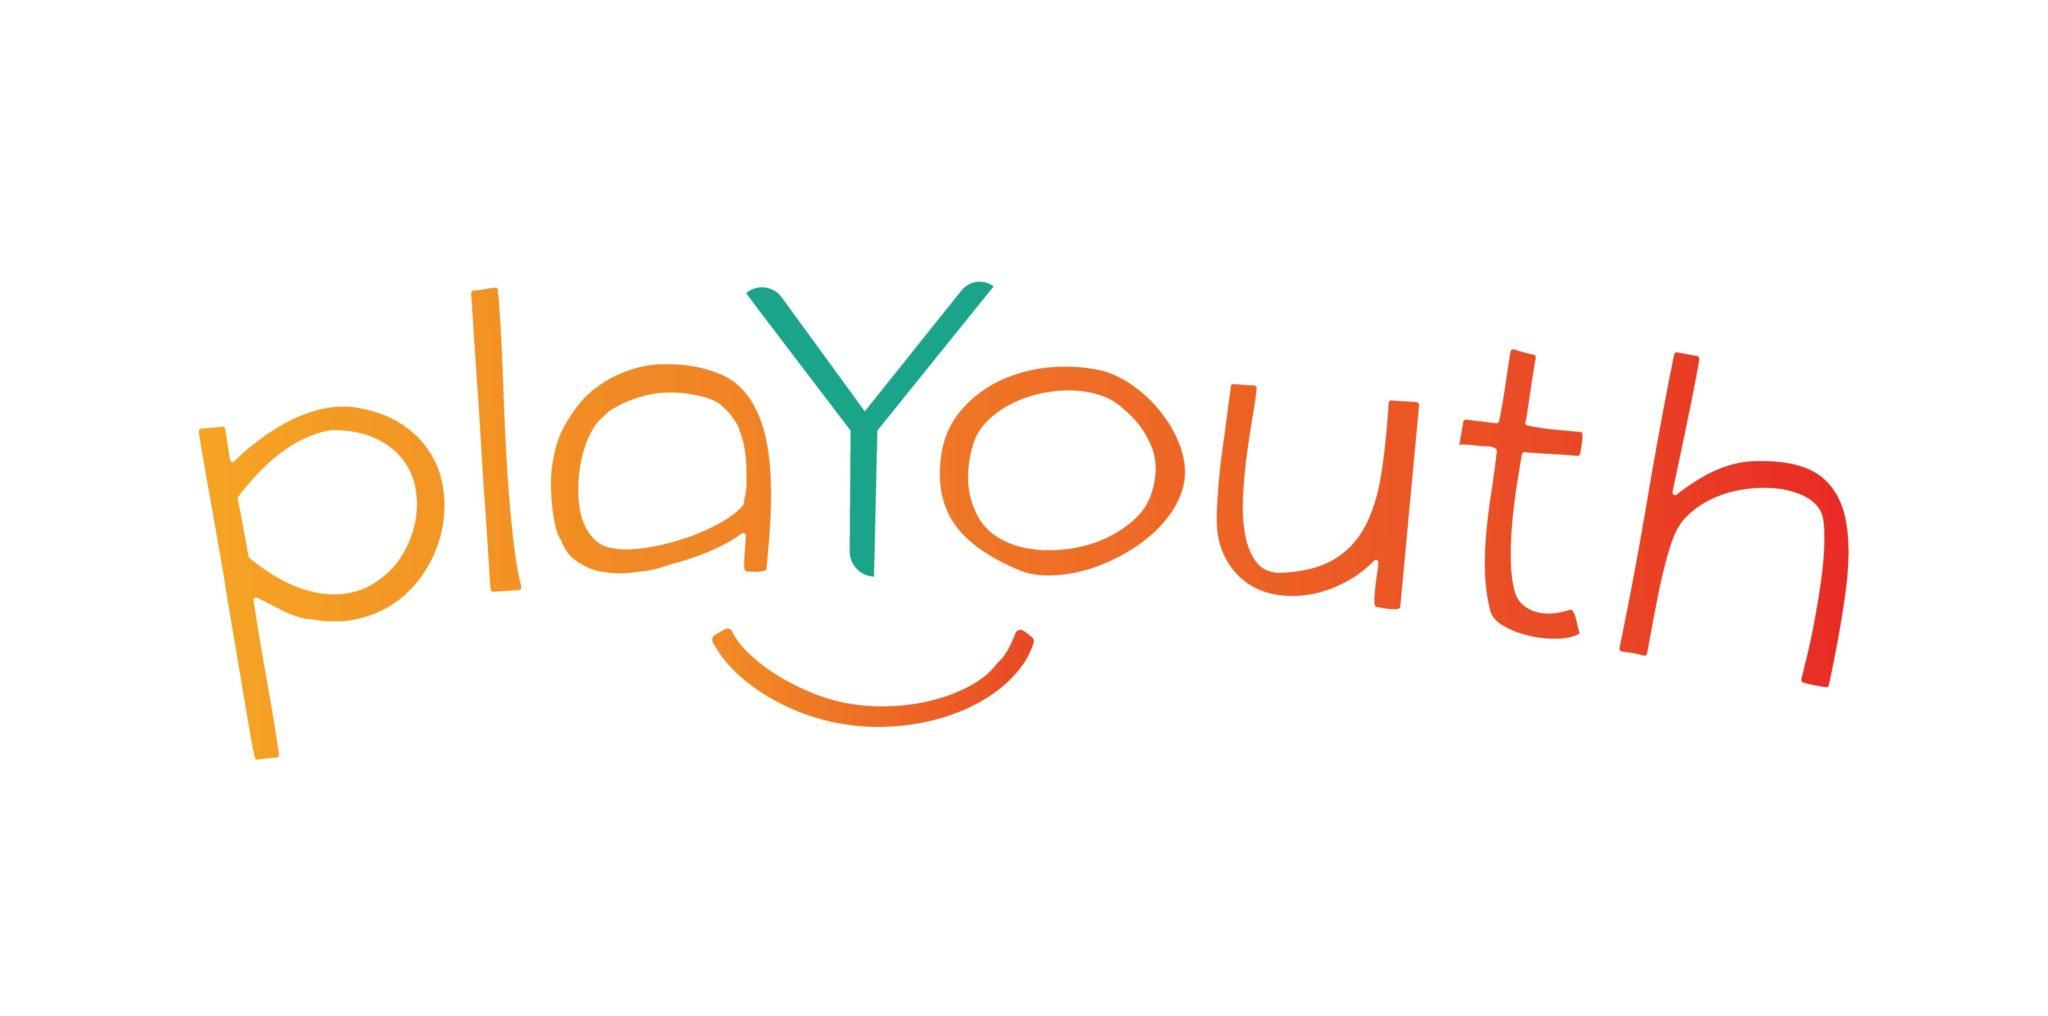 PlaYouth